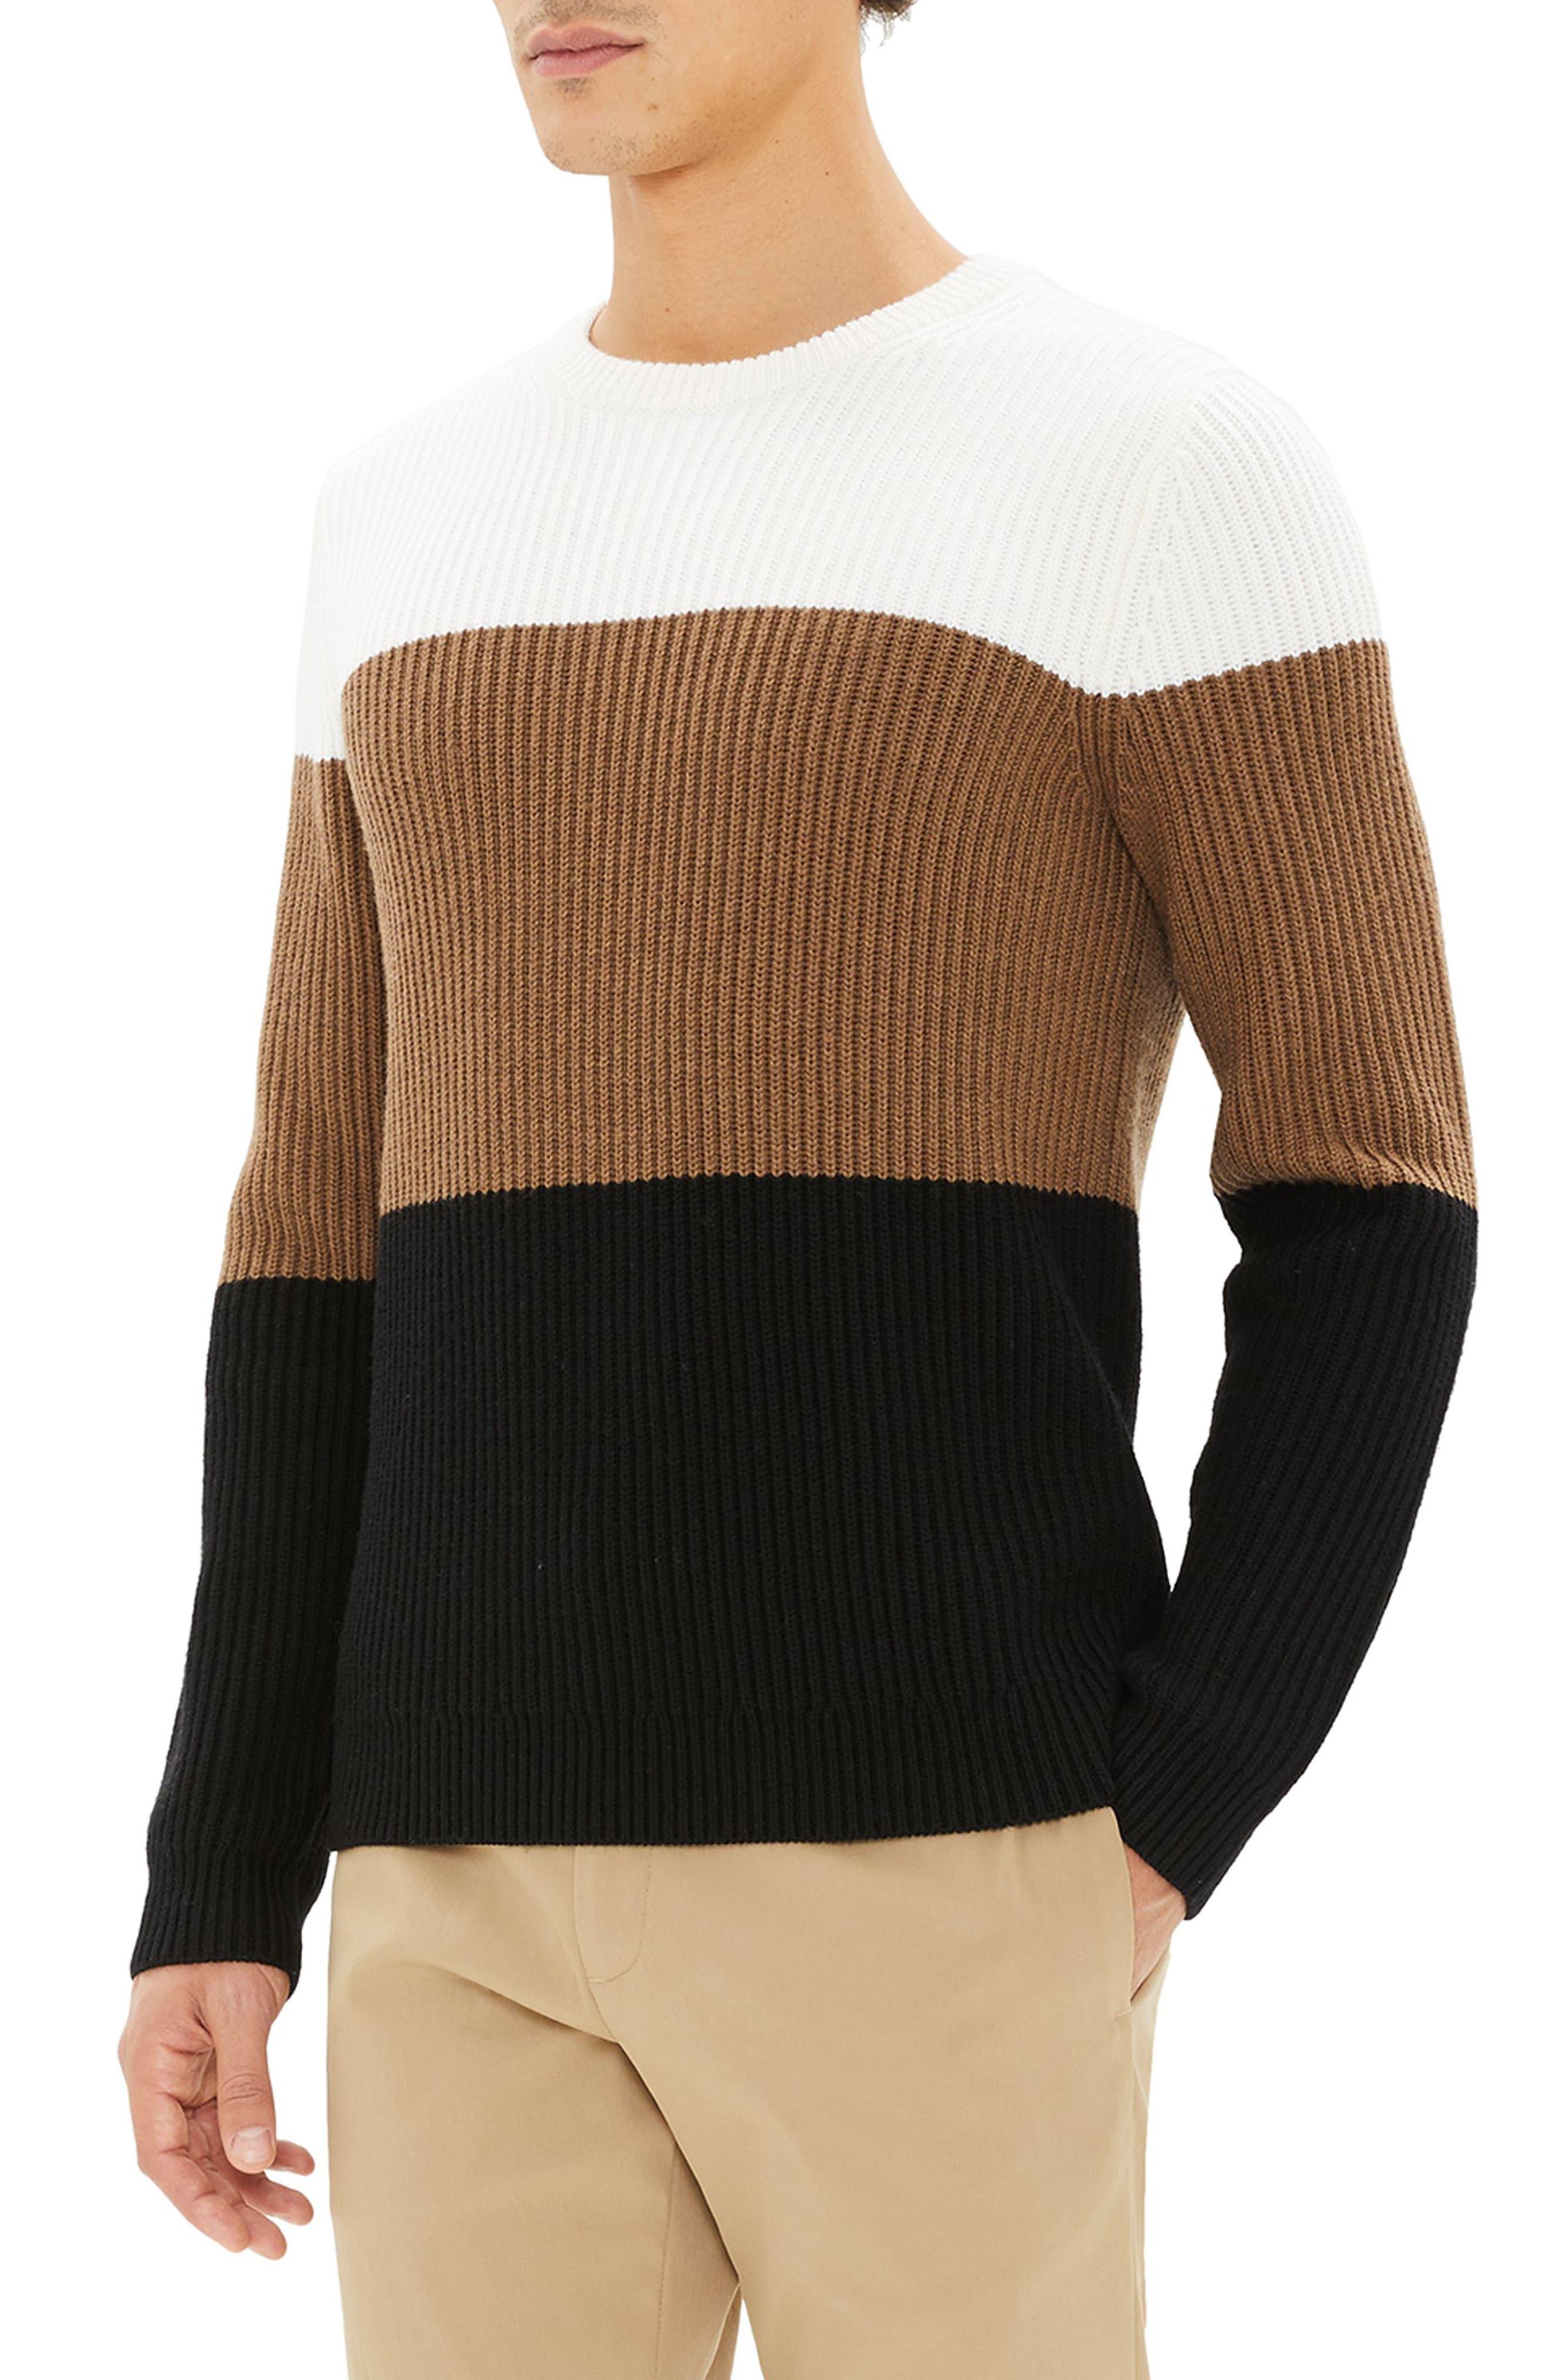 Romman Colorblock Merino Wool Sweater,                             Alternate thumbnail 3, color,                             110